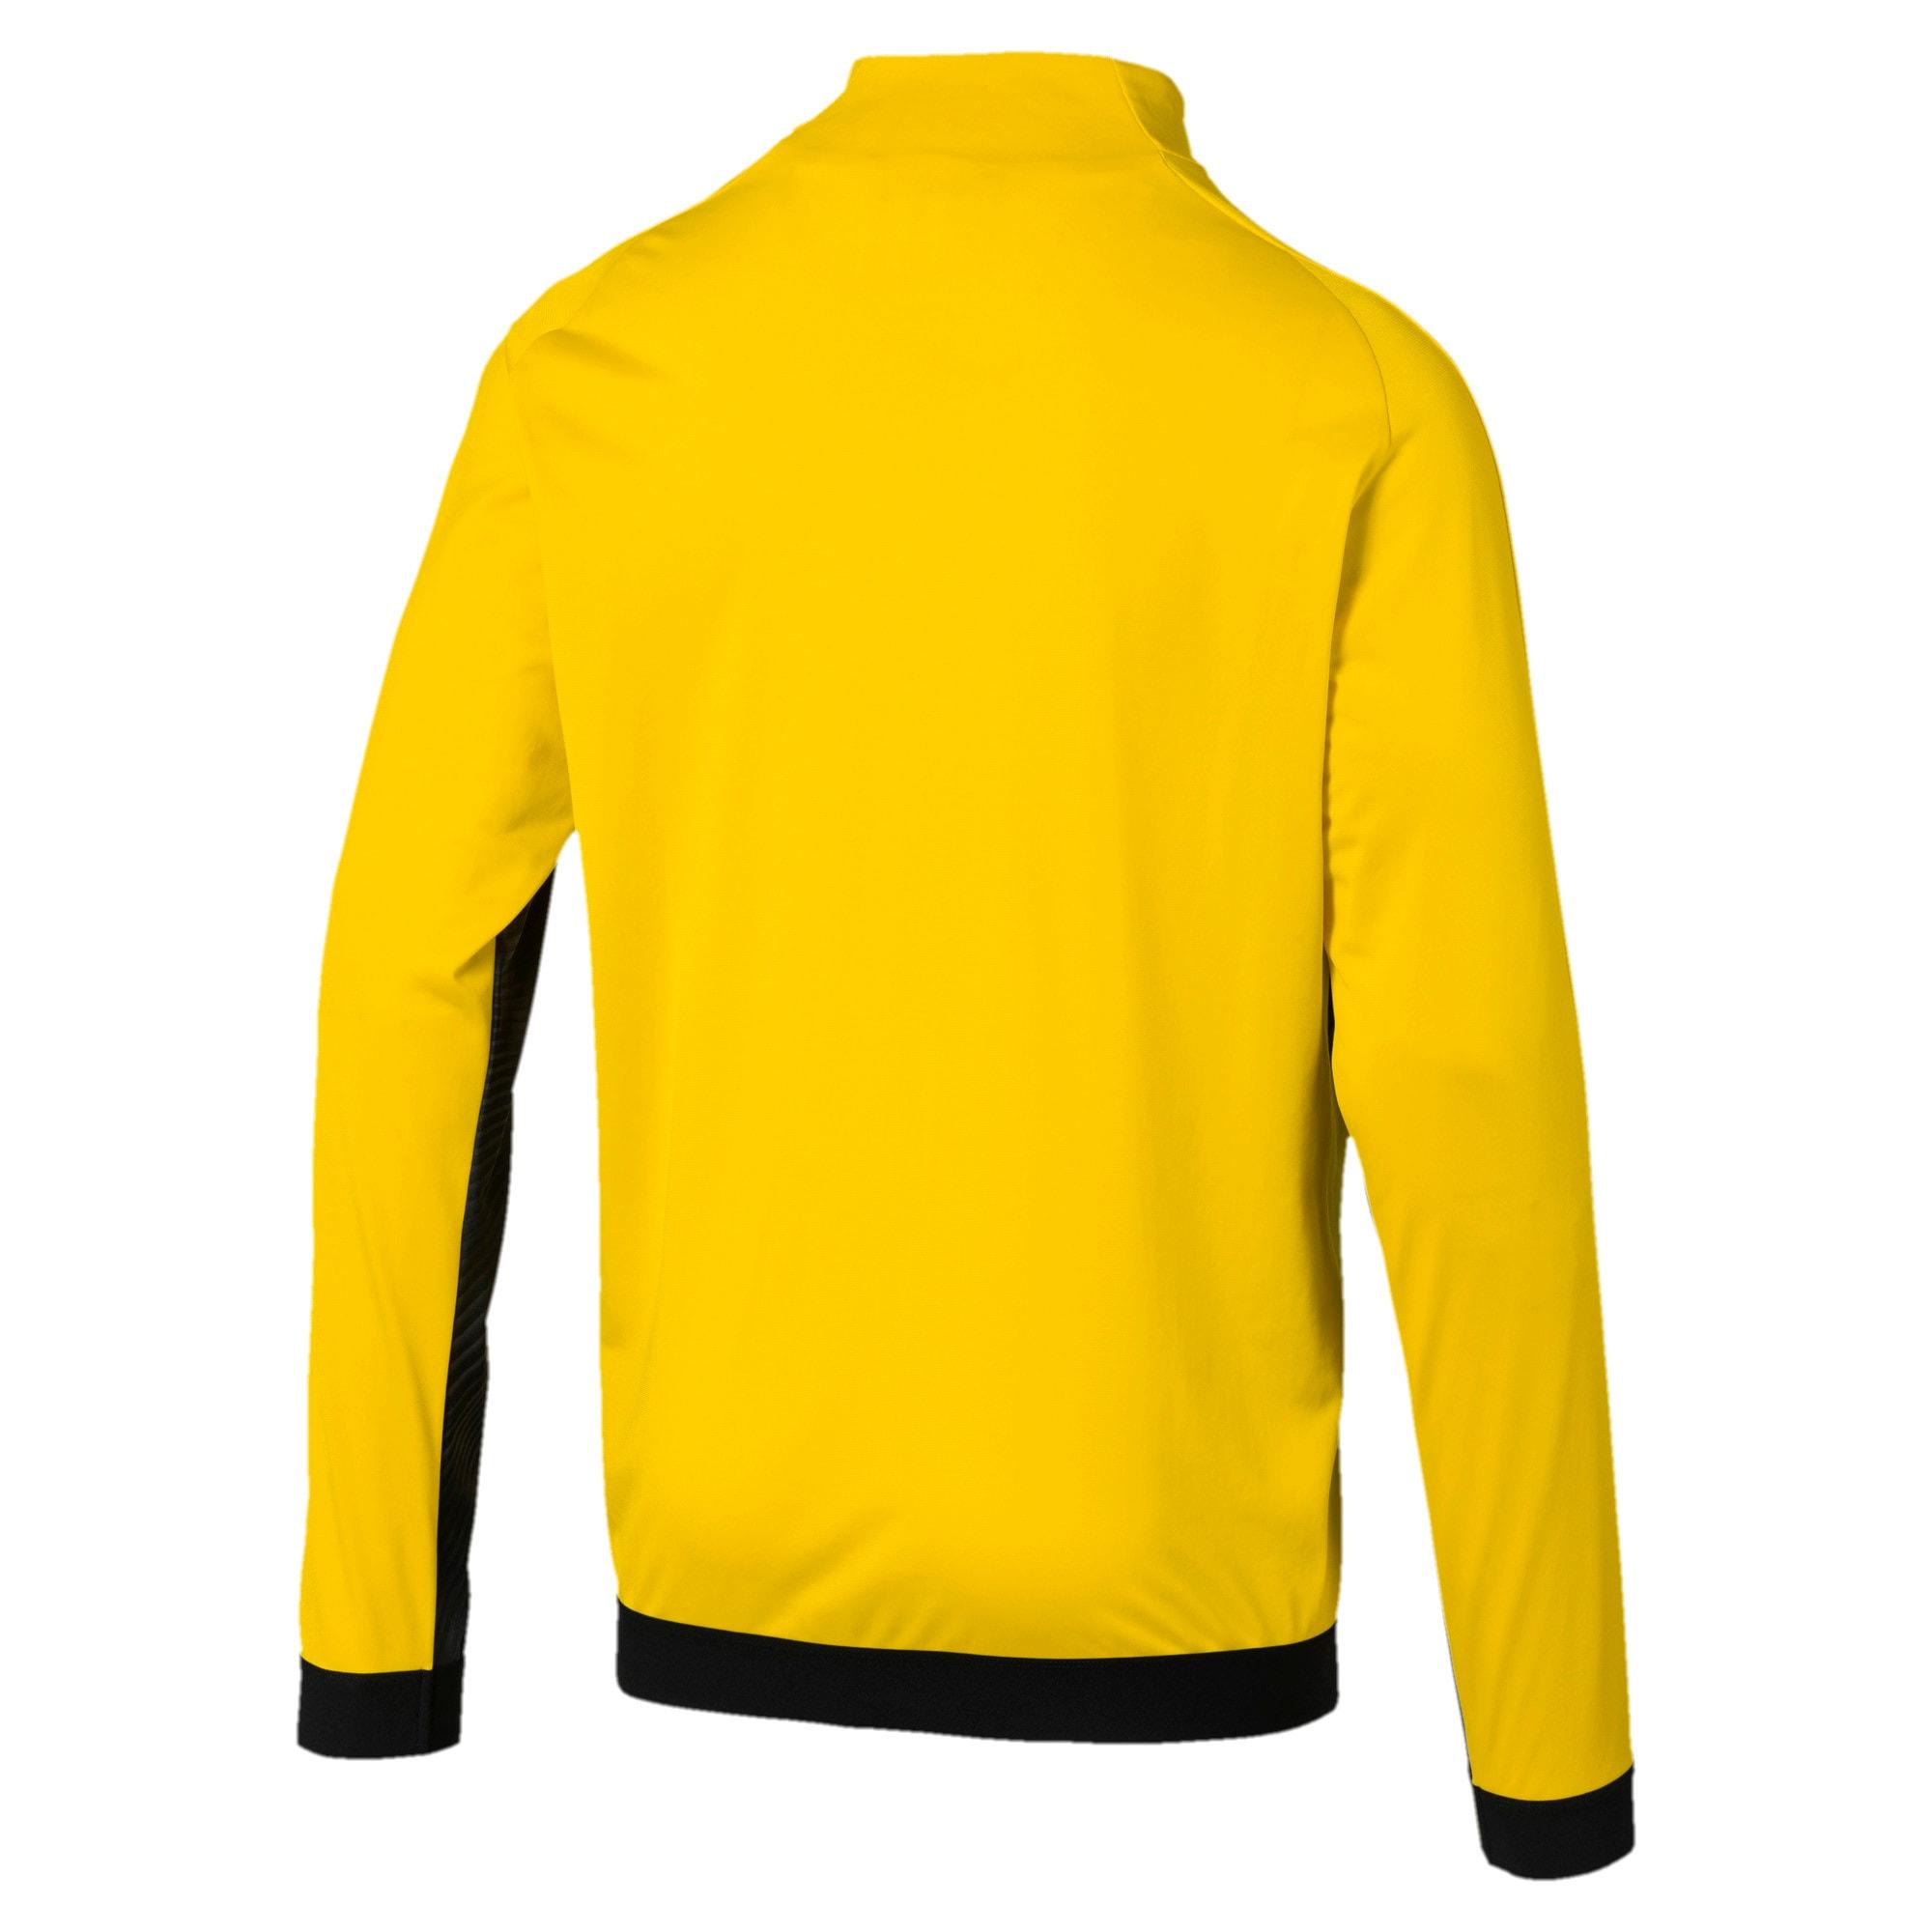 Miniatura 2 de ChaquetaBVBLeague Stadium de hombre, Cyber Yellow-Puma Black, mediano